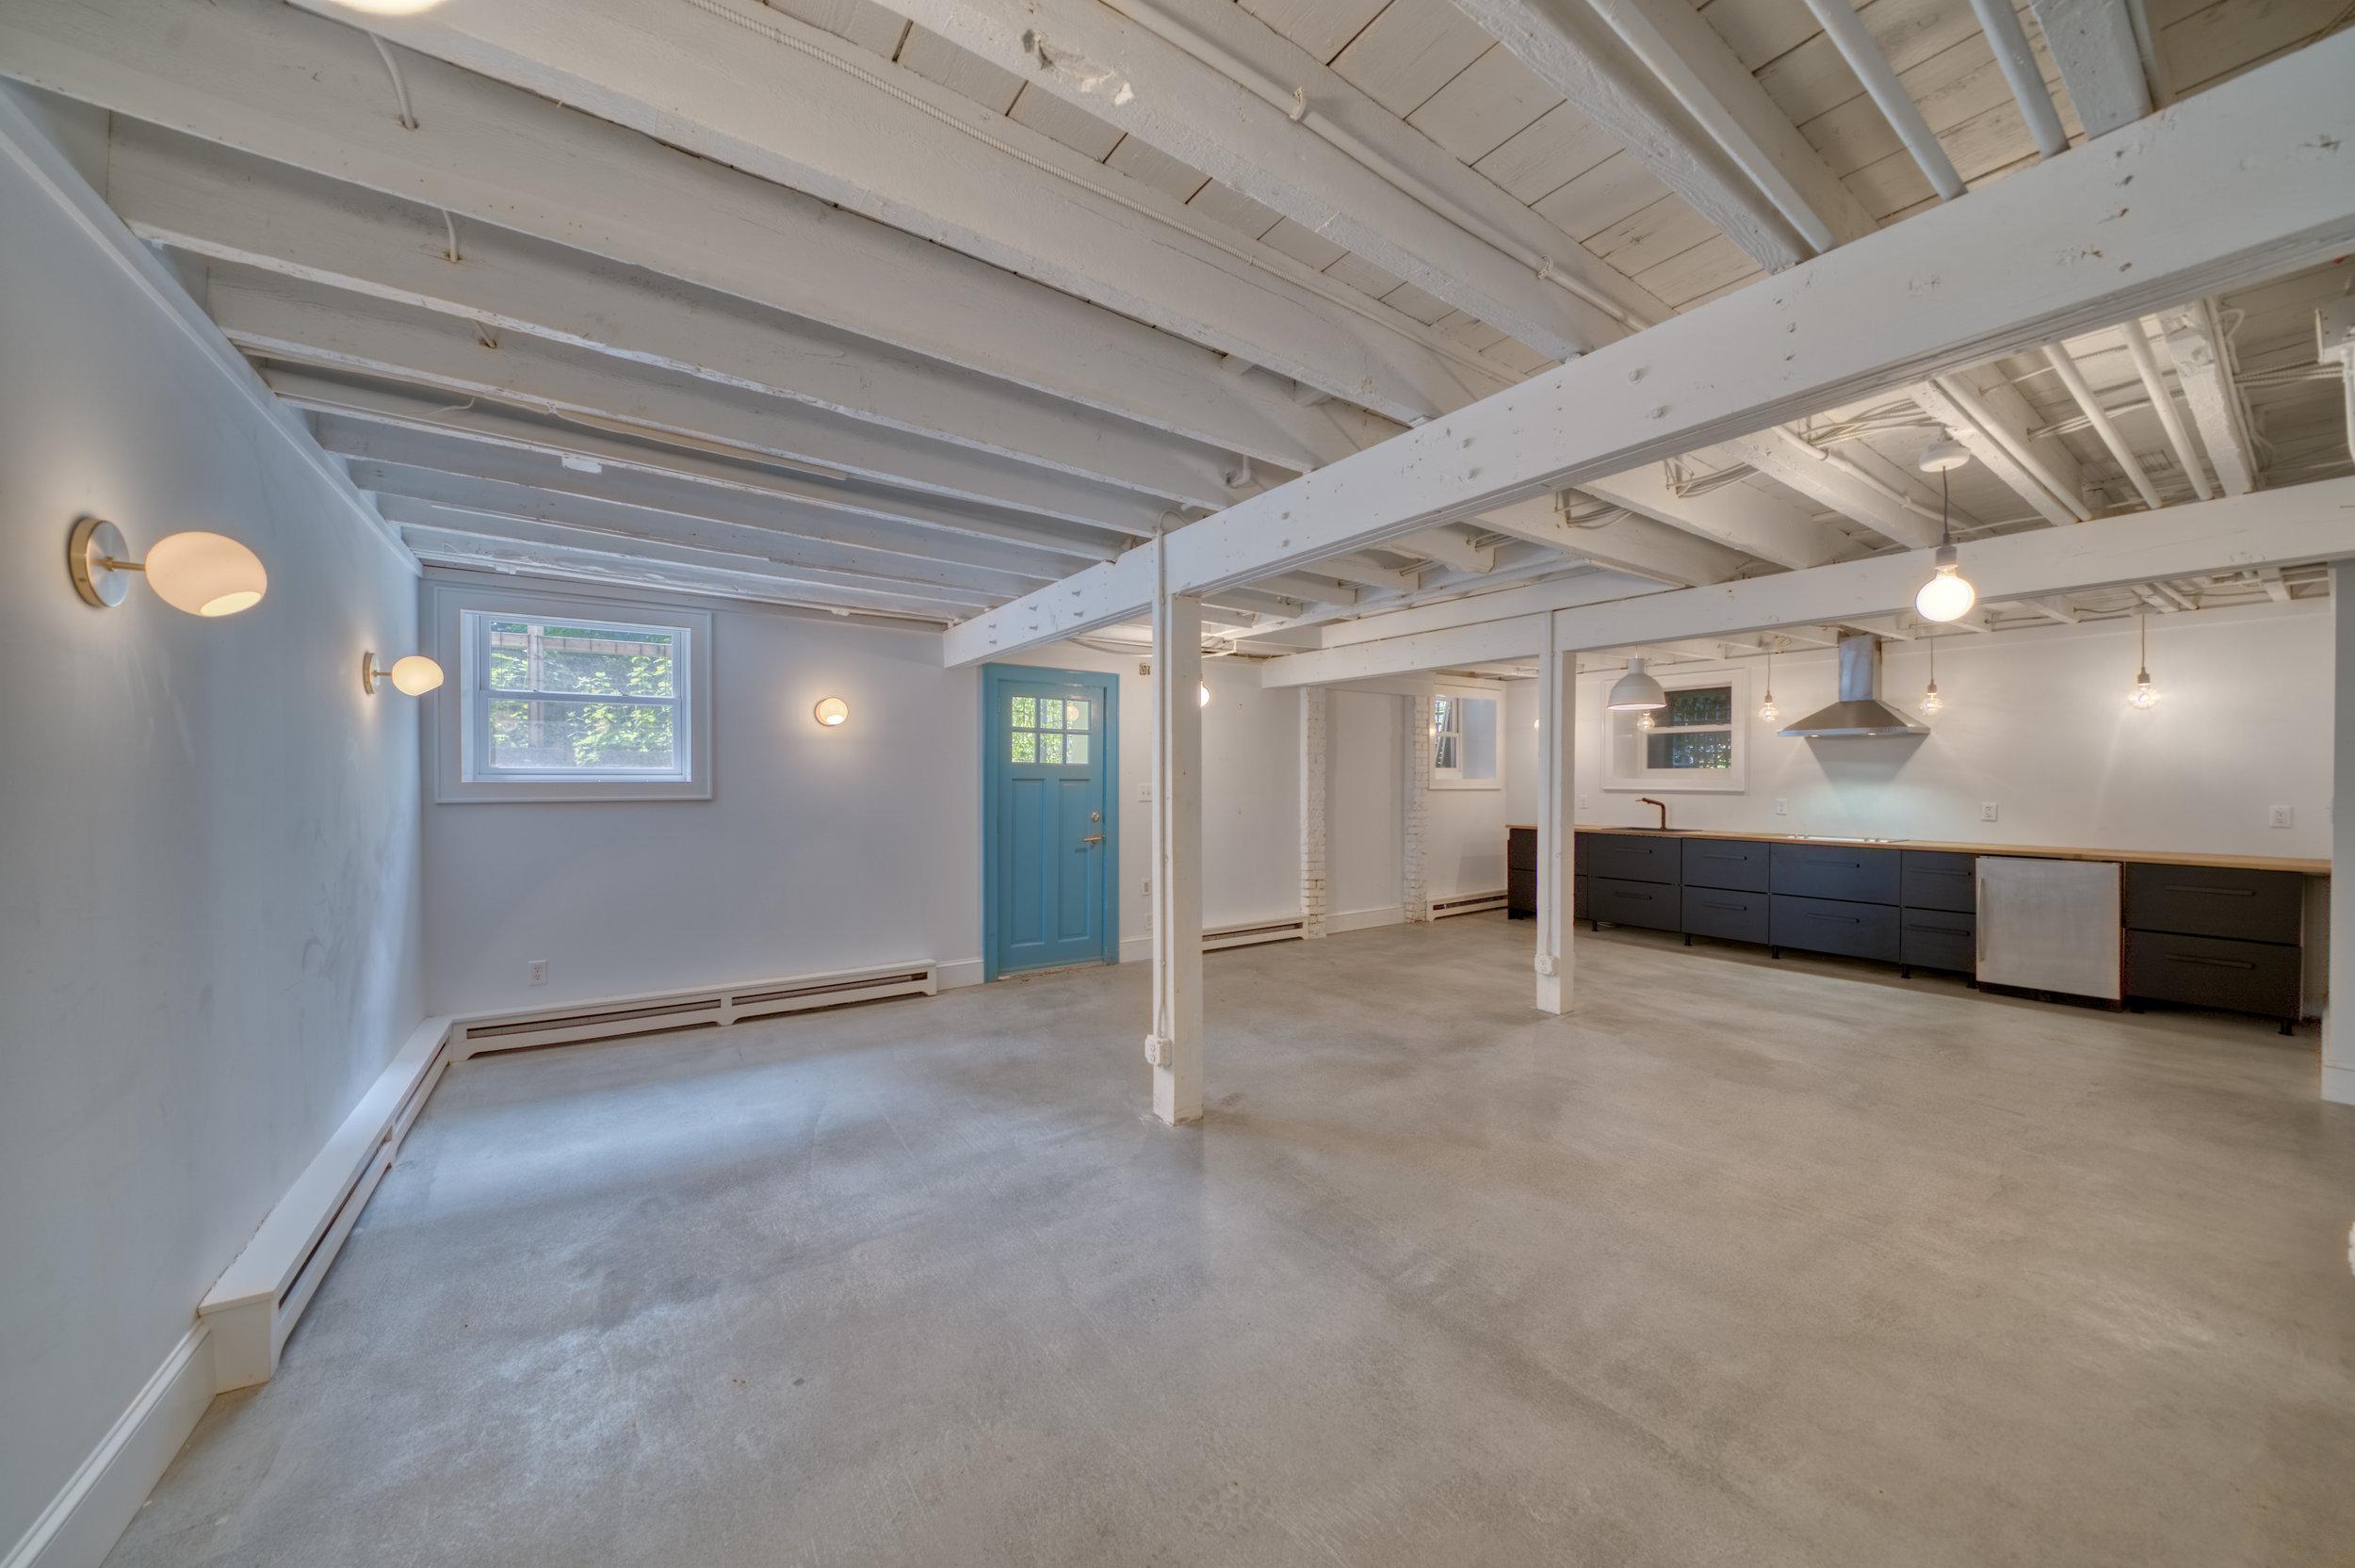 UptownKingston-Studio-Apartment-1.jpg